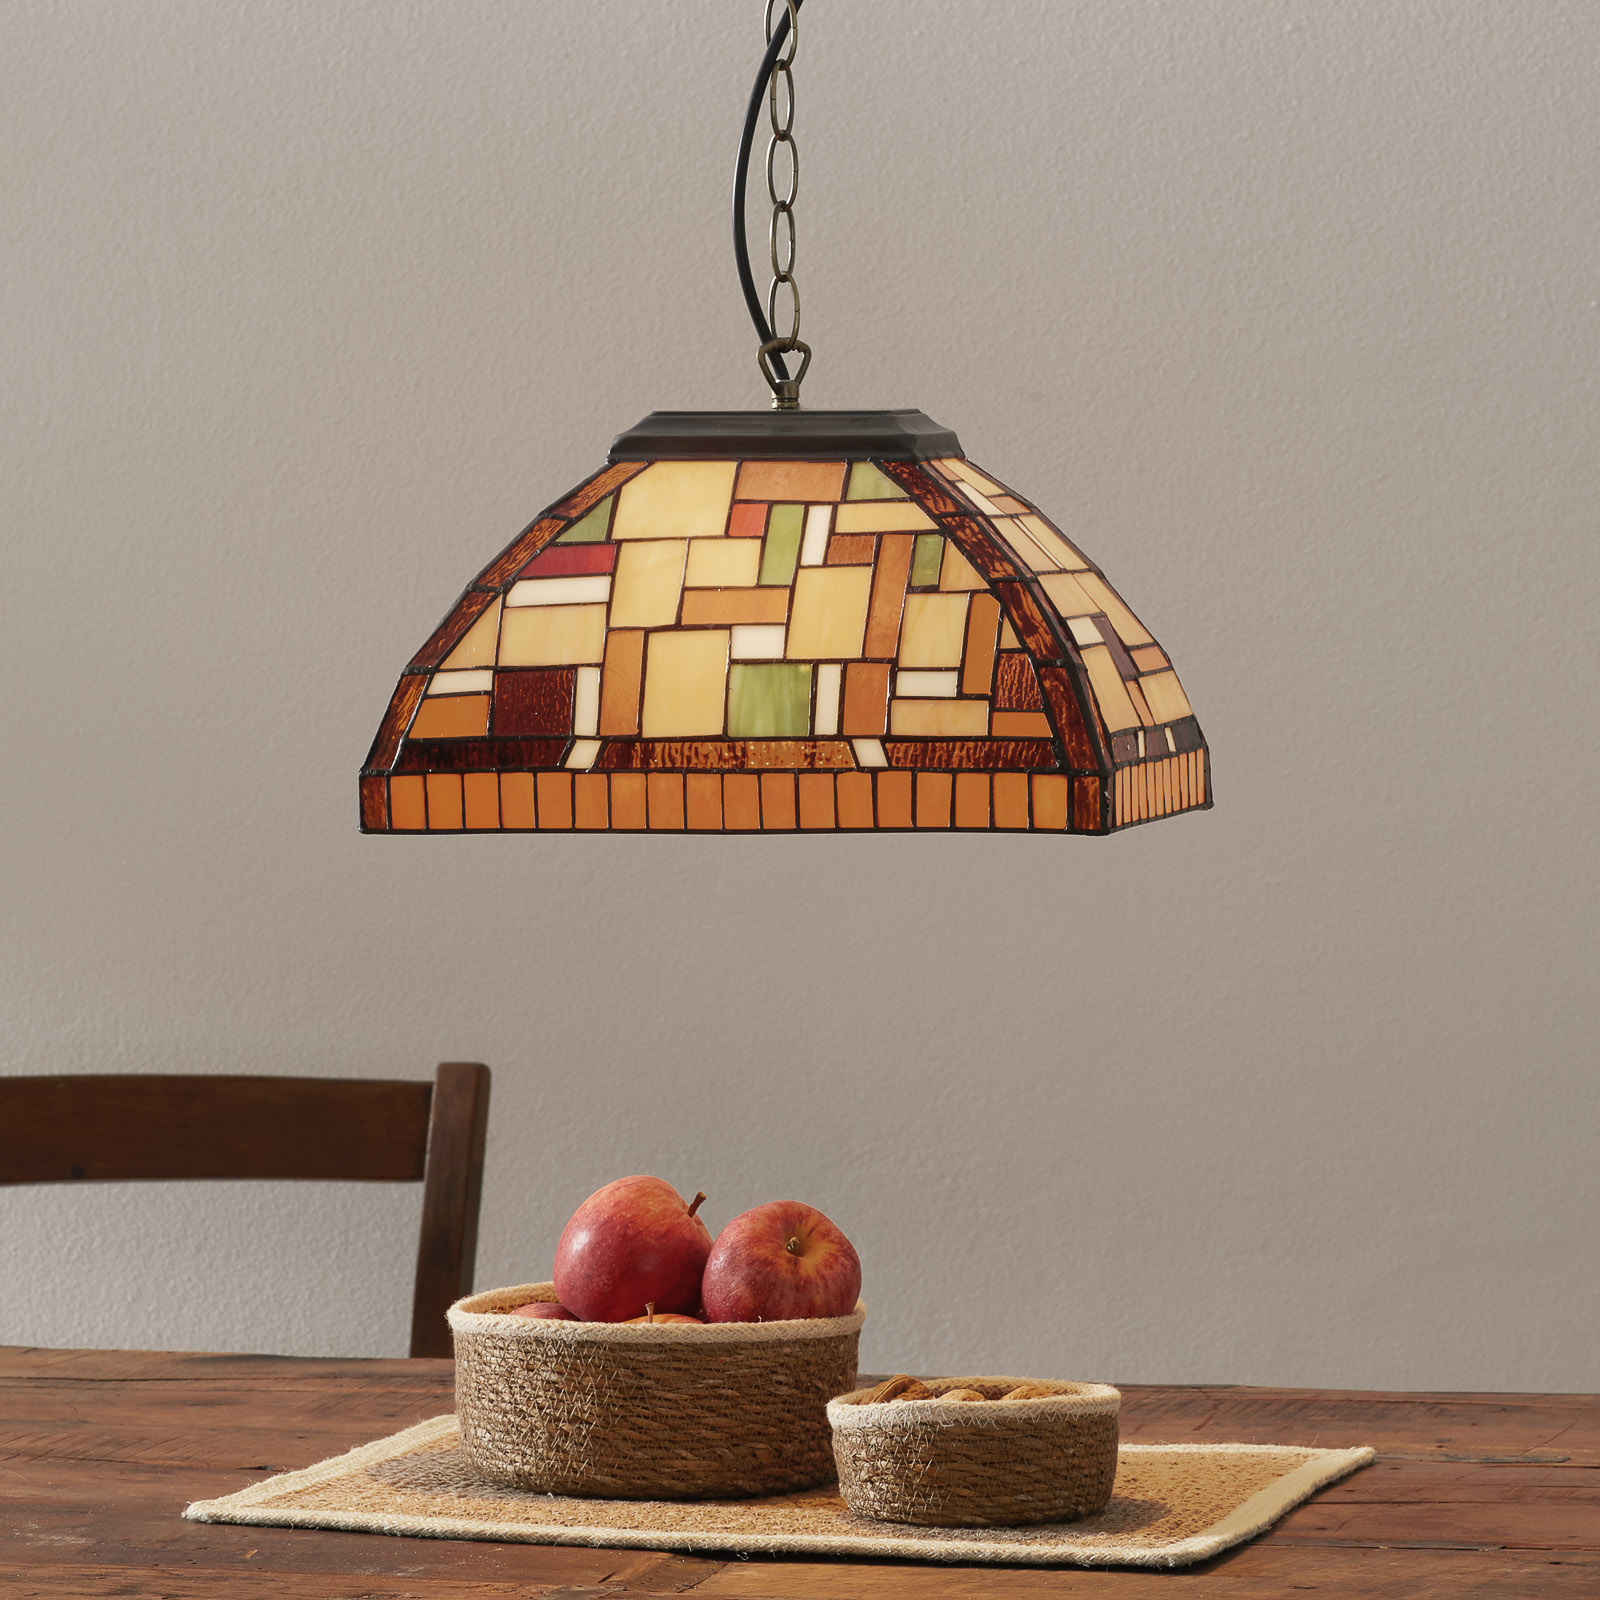 MOSAICO - hanglamp in Tiffany-stijl